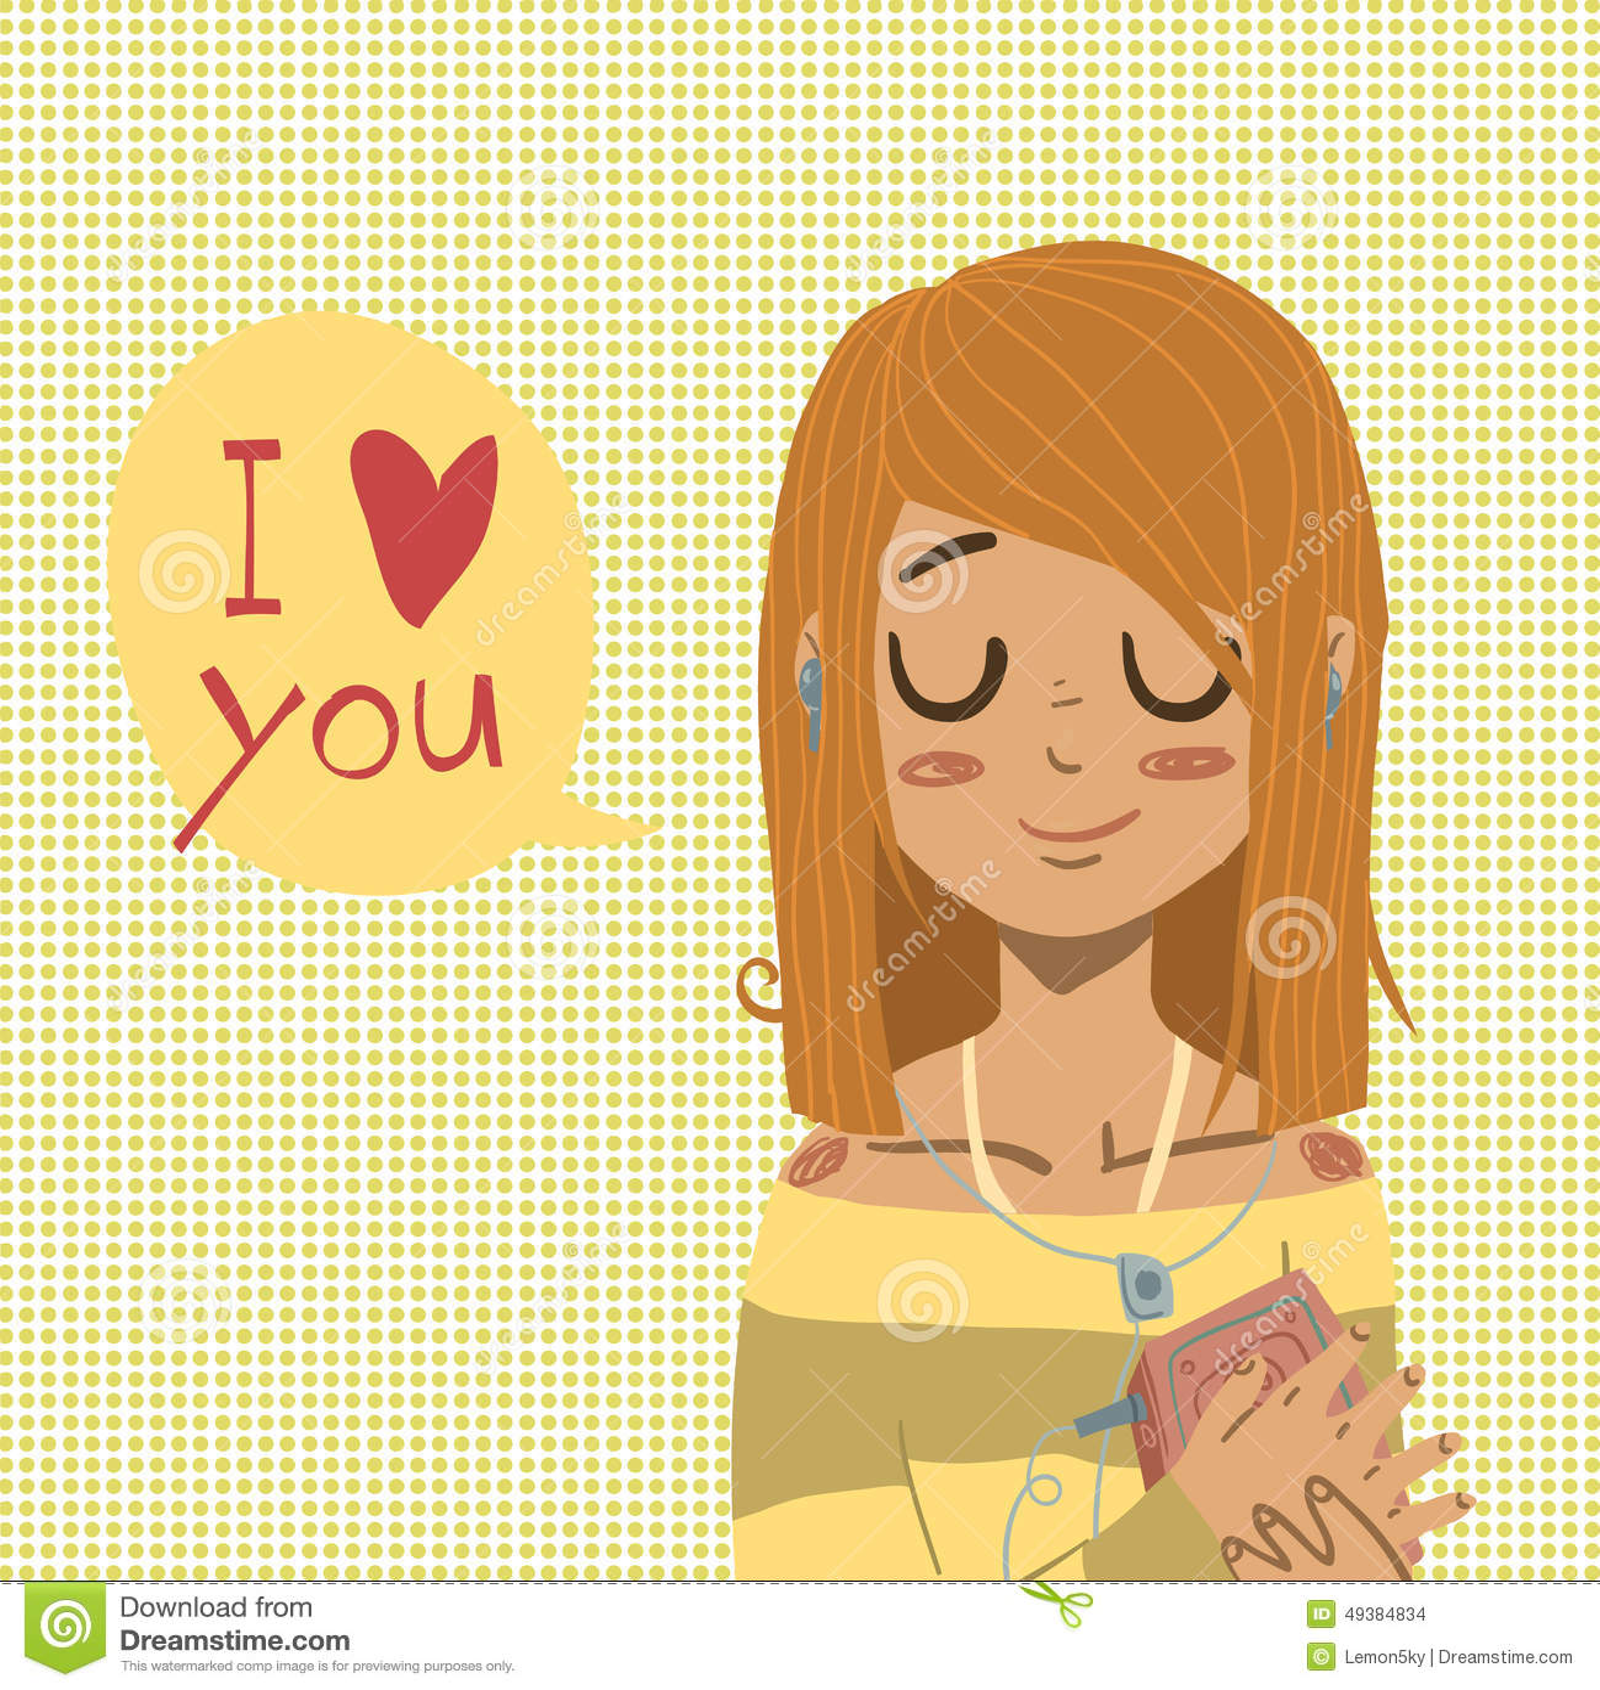 Wonderful Wallpaper I Love You Cartoon - vector-cartoon-flat-i-love-you-greeting-card-romantic-cute-red-head-girl-bubble-ui-web-games-tablets-wallpapers-49384834  Snapshot_84851   .jpg